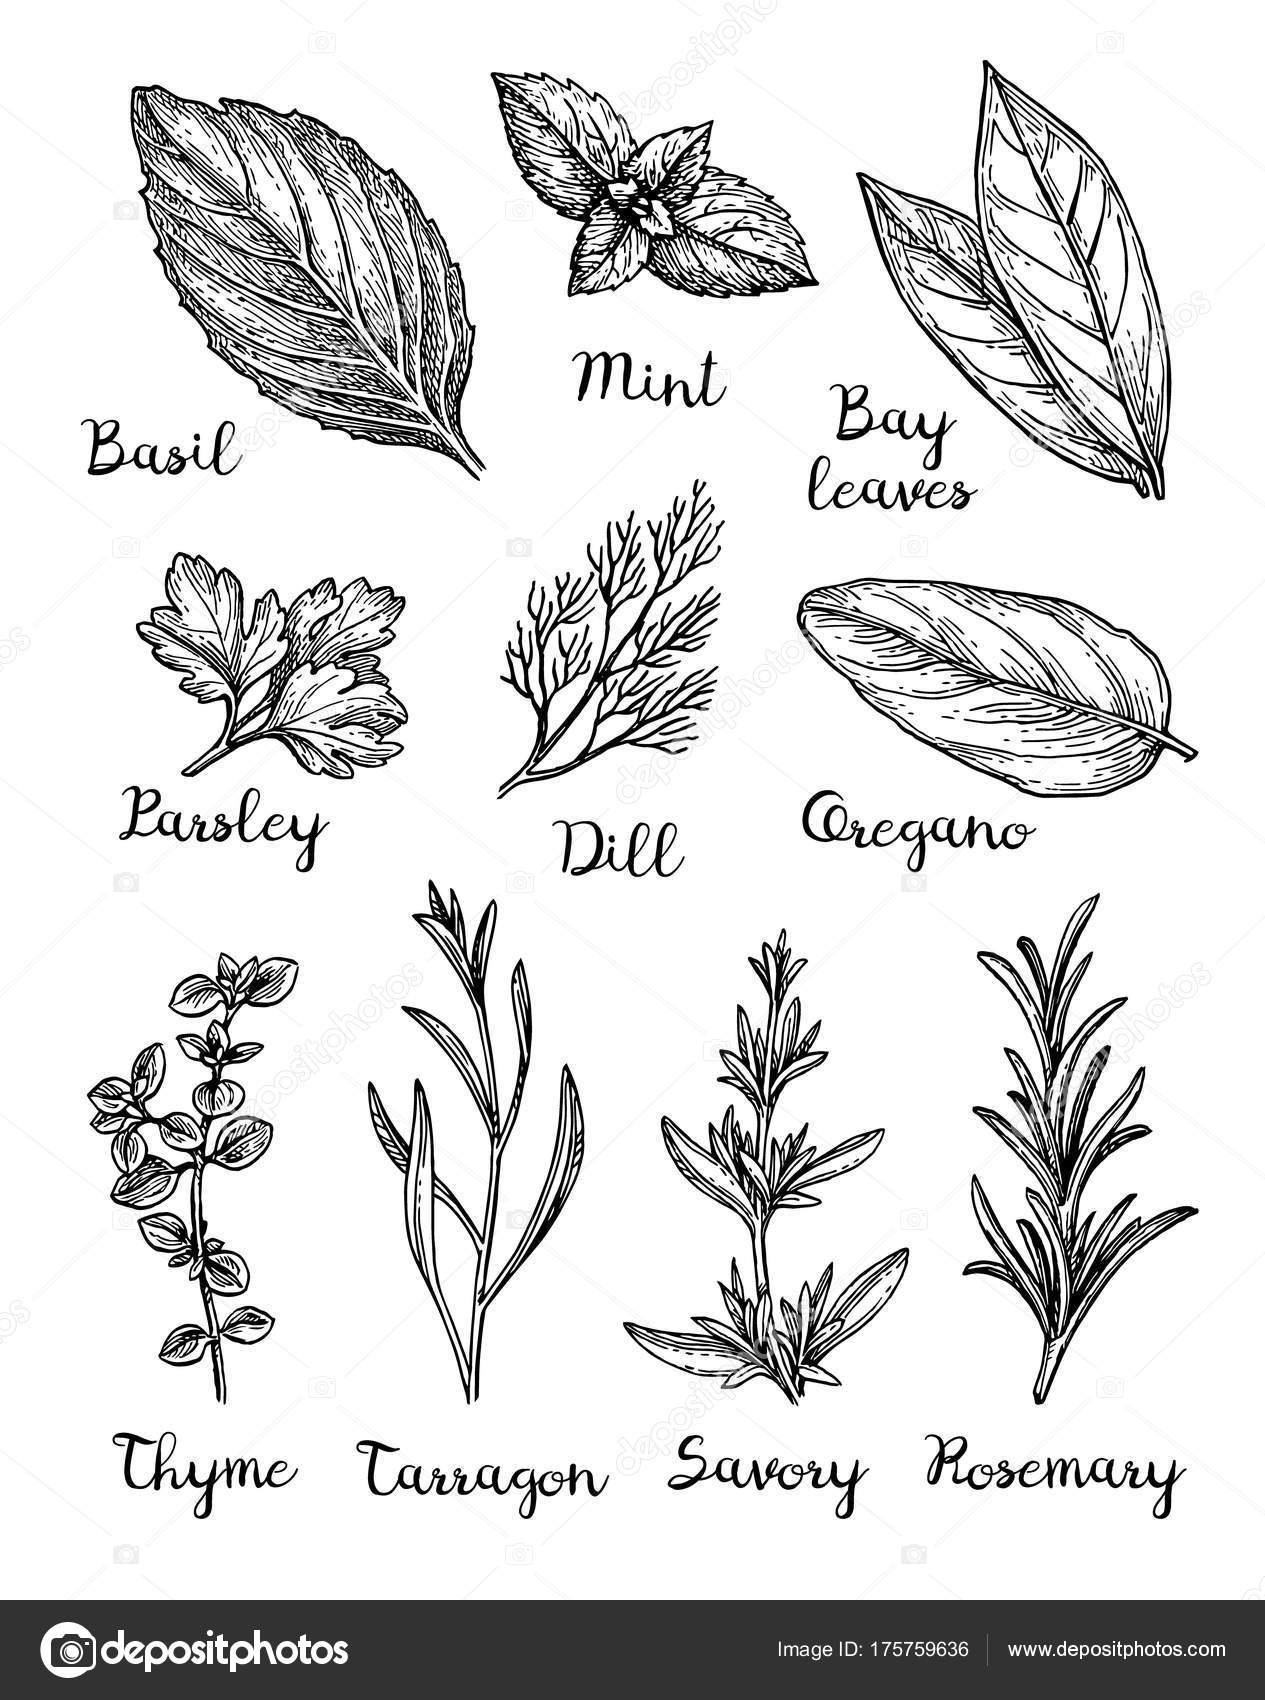 kitchen herb kit ikea base cabinets 草本墨水素描 图库矢量图像 c alhontess gmail com 175759636 草药套装 在白色背景上隔离的墨迹草图的集合 手绘矢量插图 复古风格 矢量图片alhontess